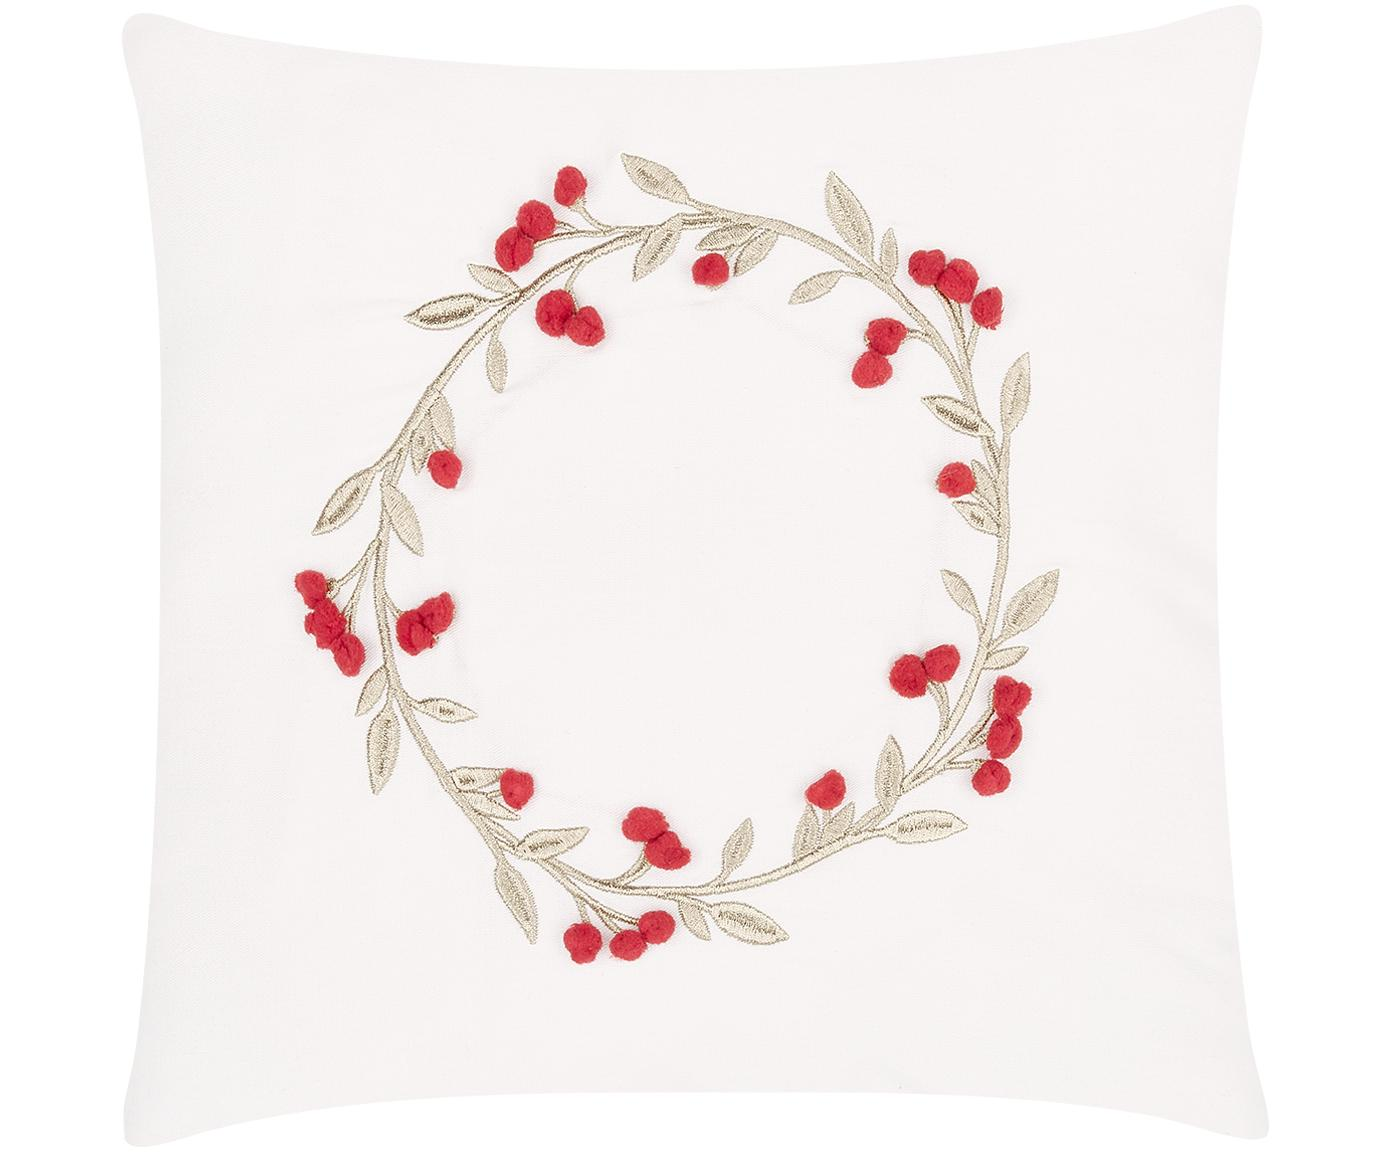 Kussenhoes Christmas Wreath met kerstmotief, Crèmewit, 40 x 40 cm